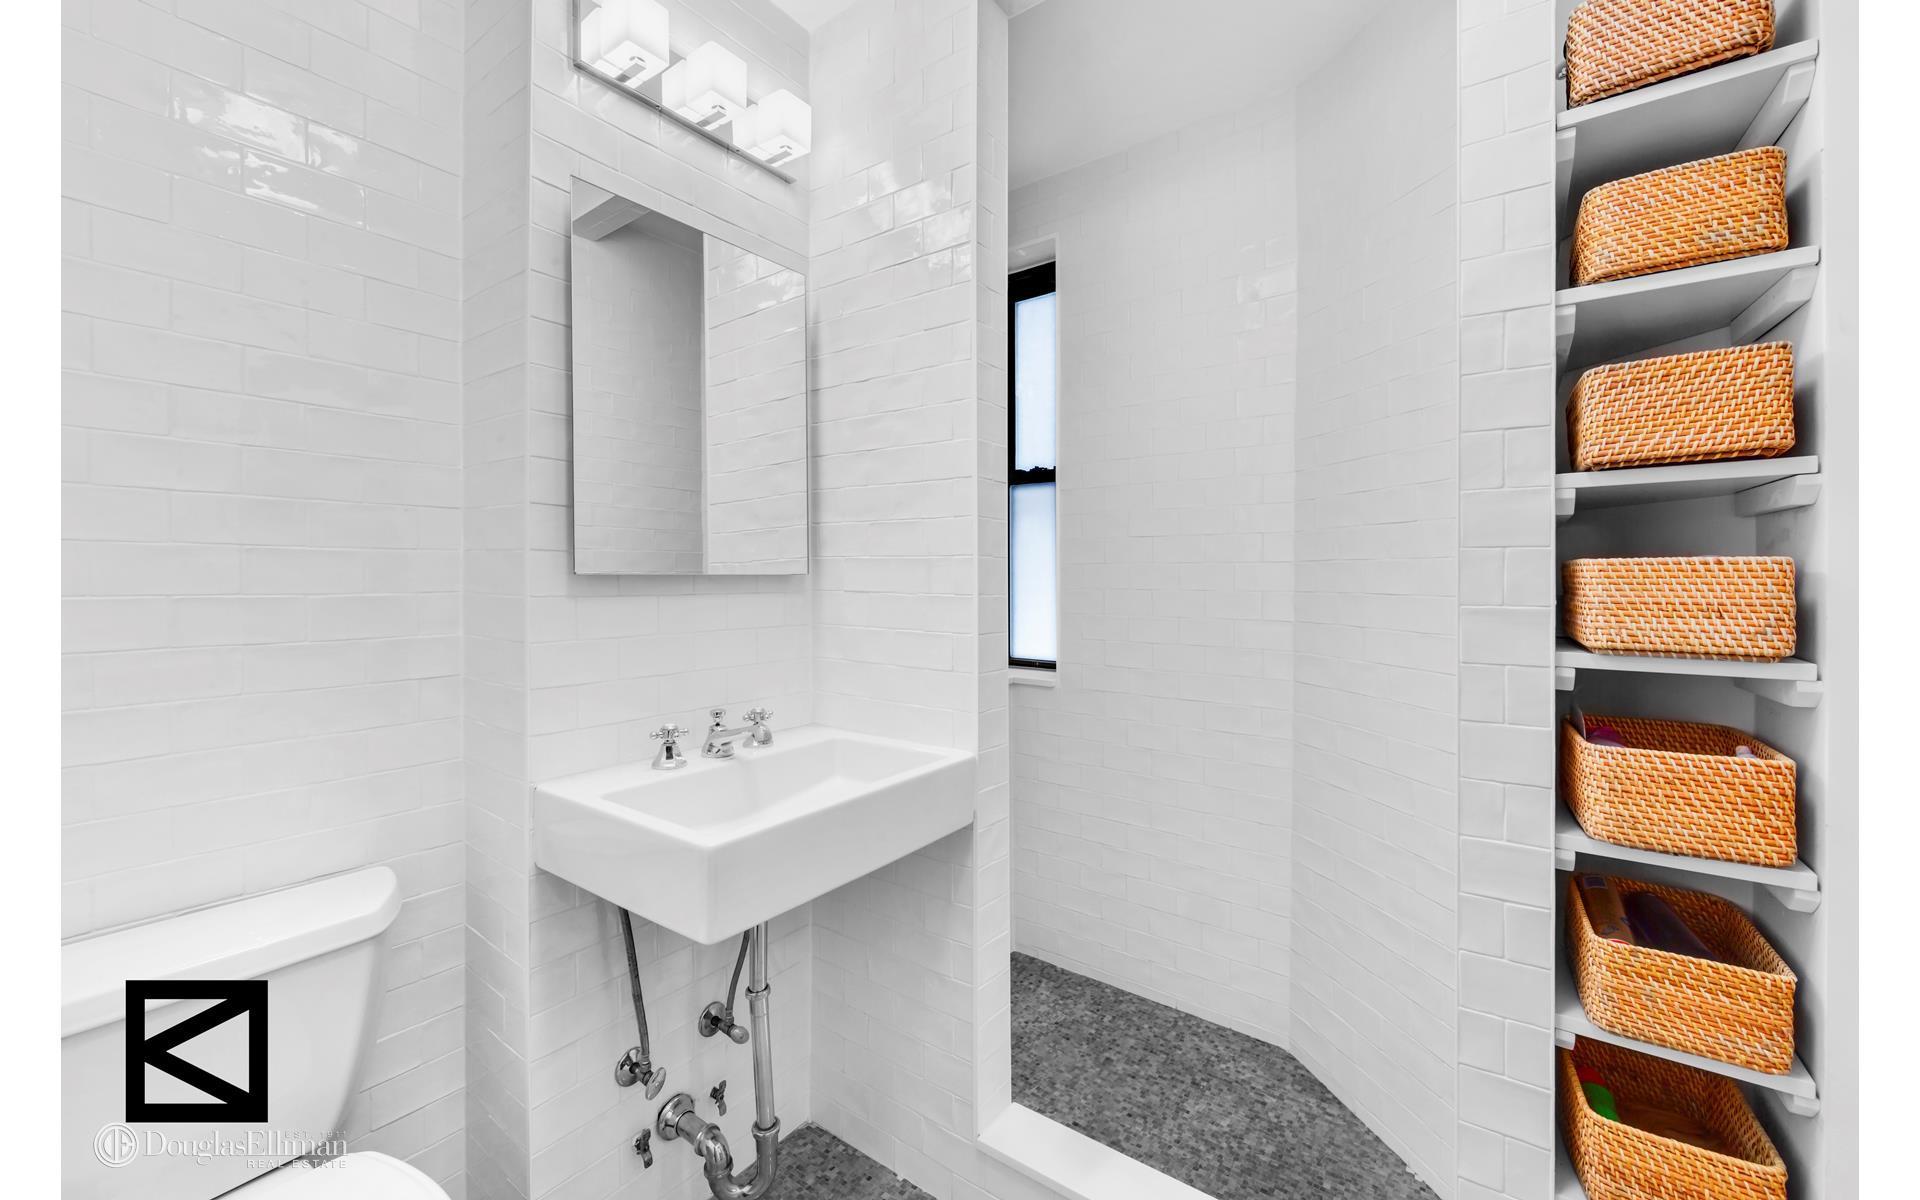 Diane Kruger Buys New York Condo Bathroom